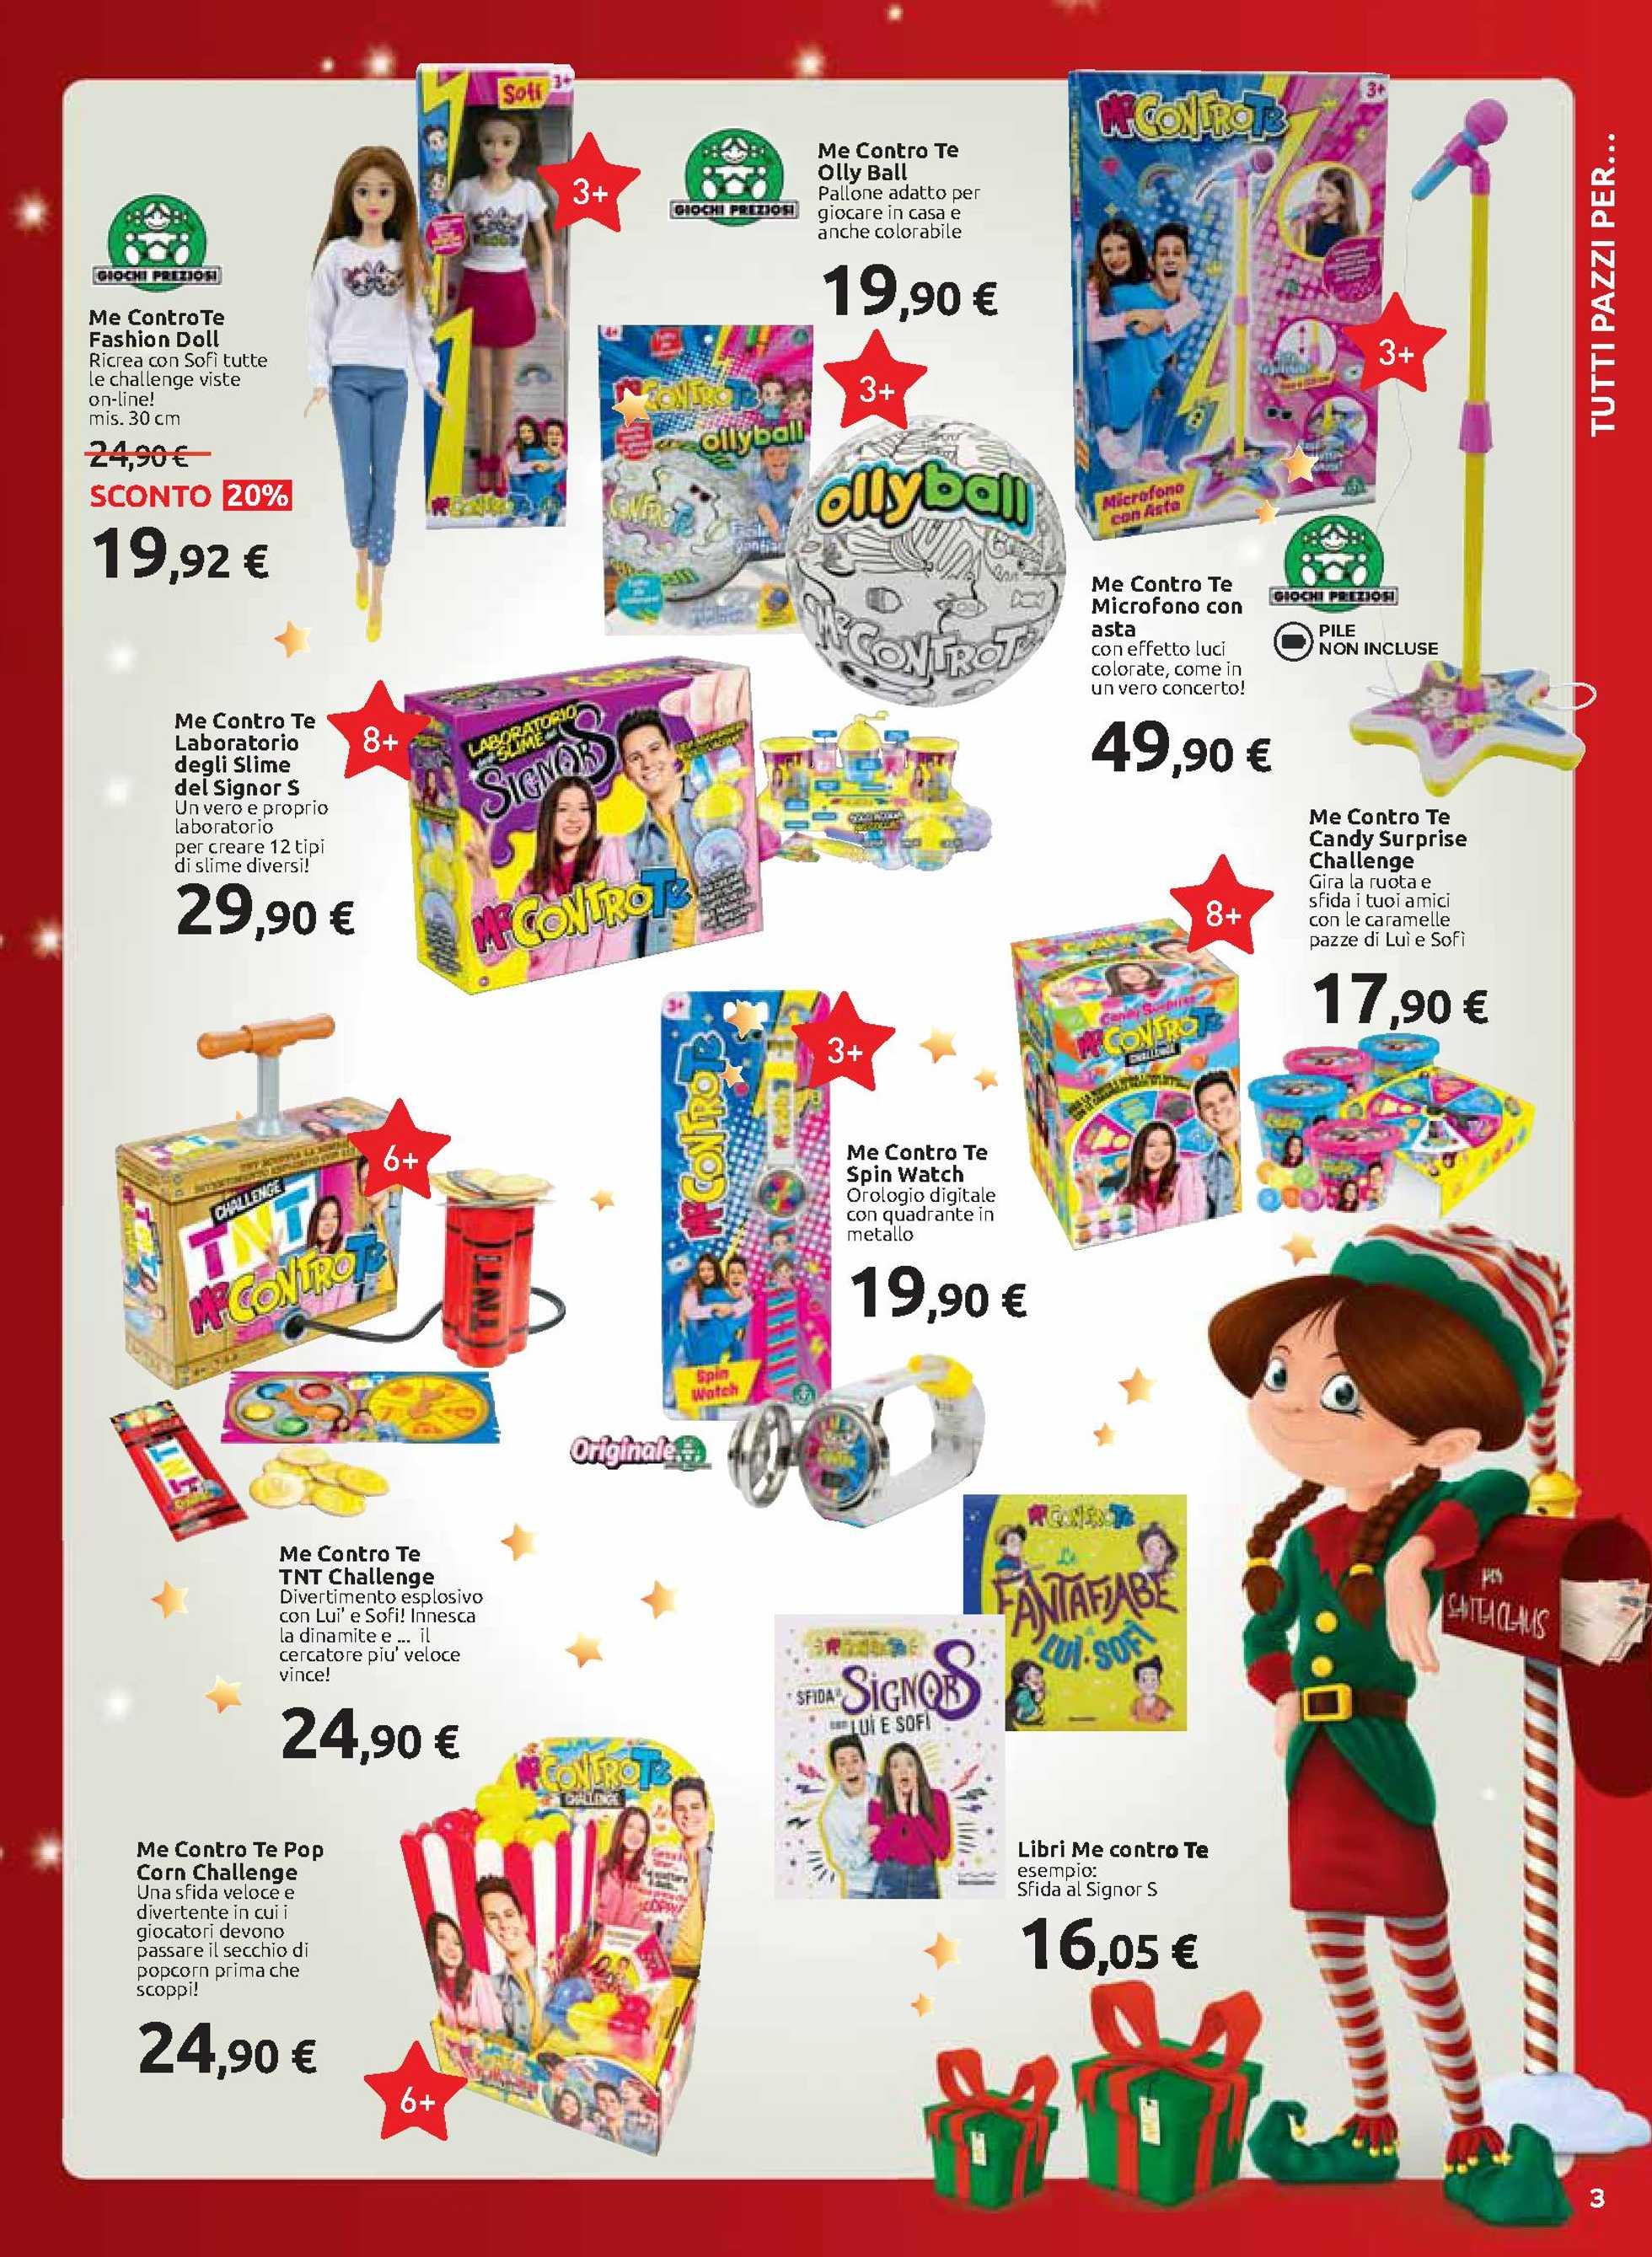 Carrefour Iper - offerte valide dal 28.10.2020 al 24.12.2020 - pagina 3.